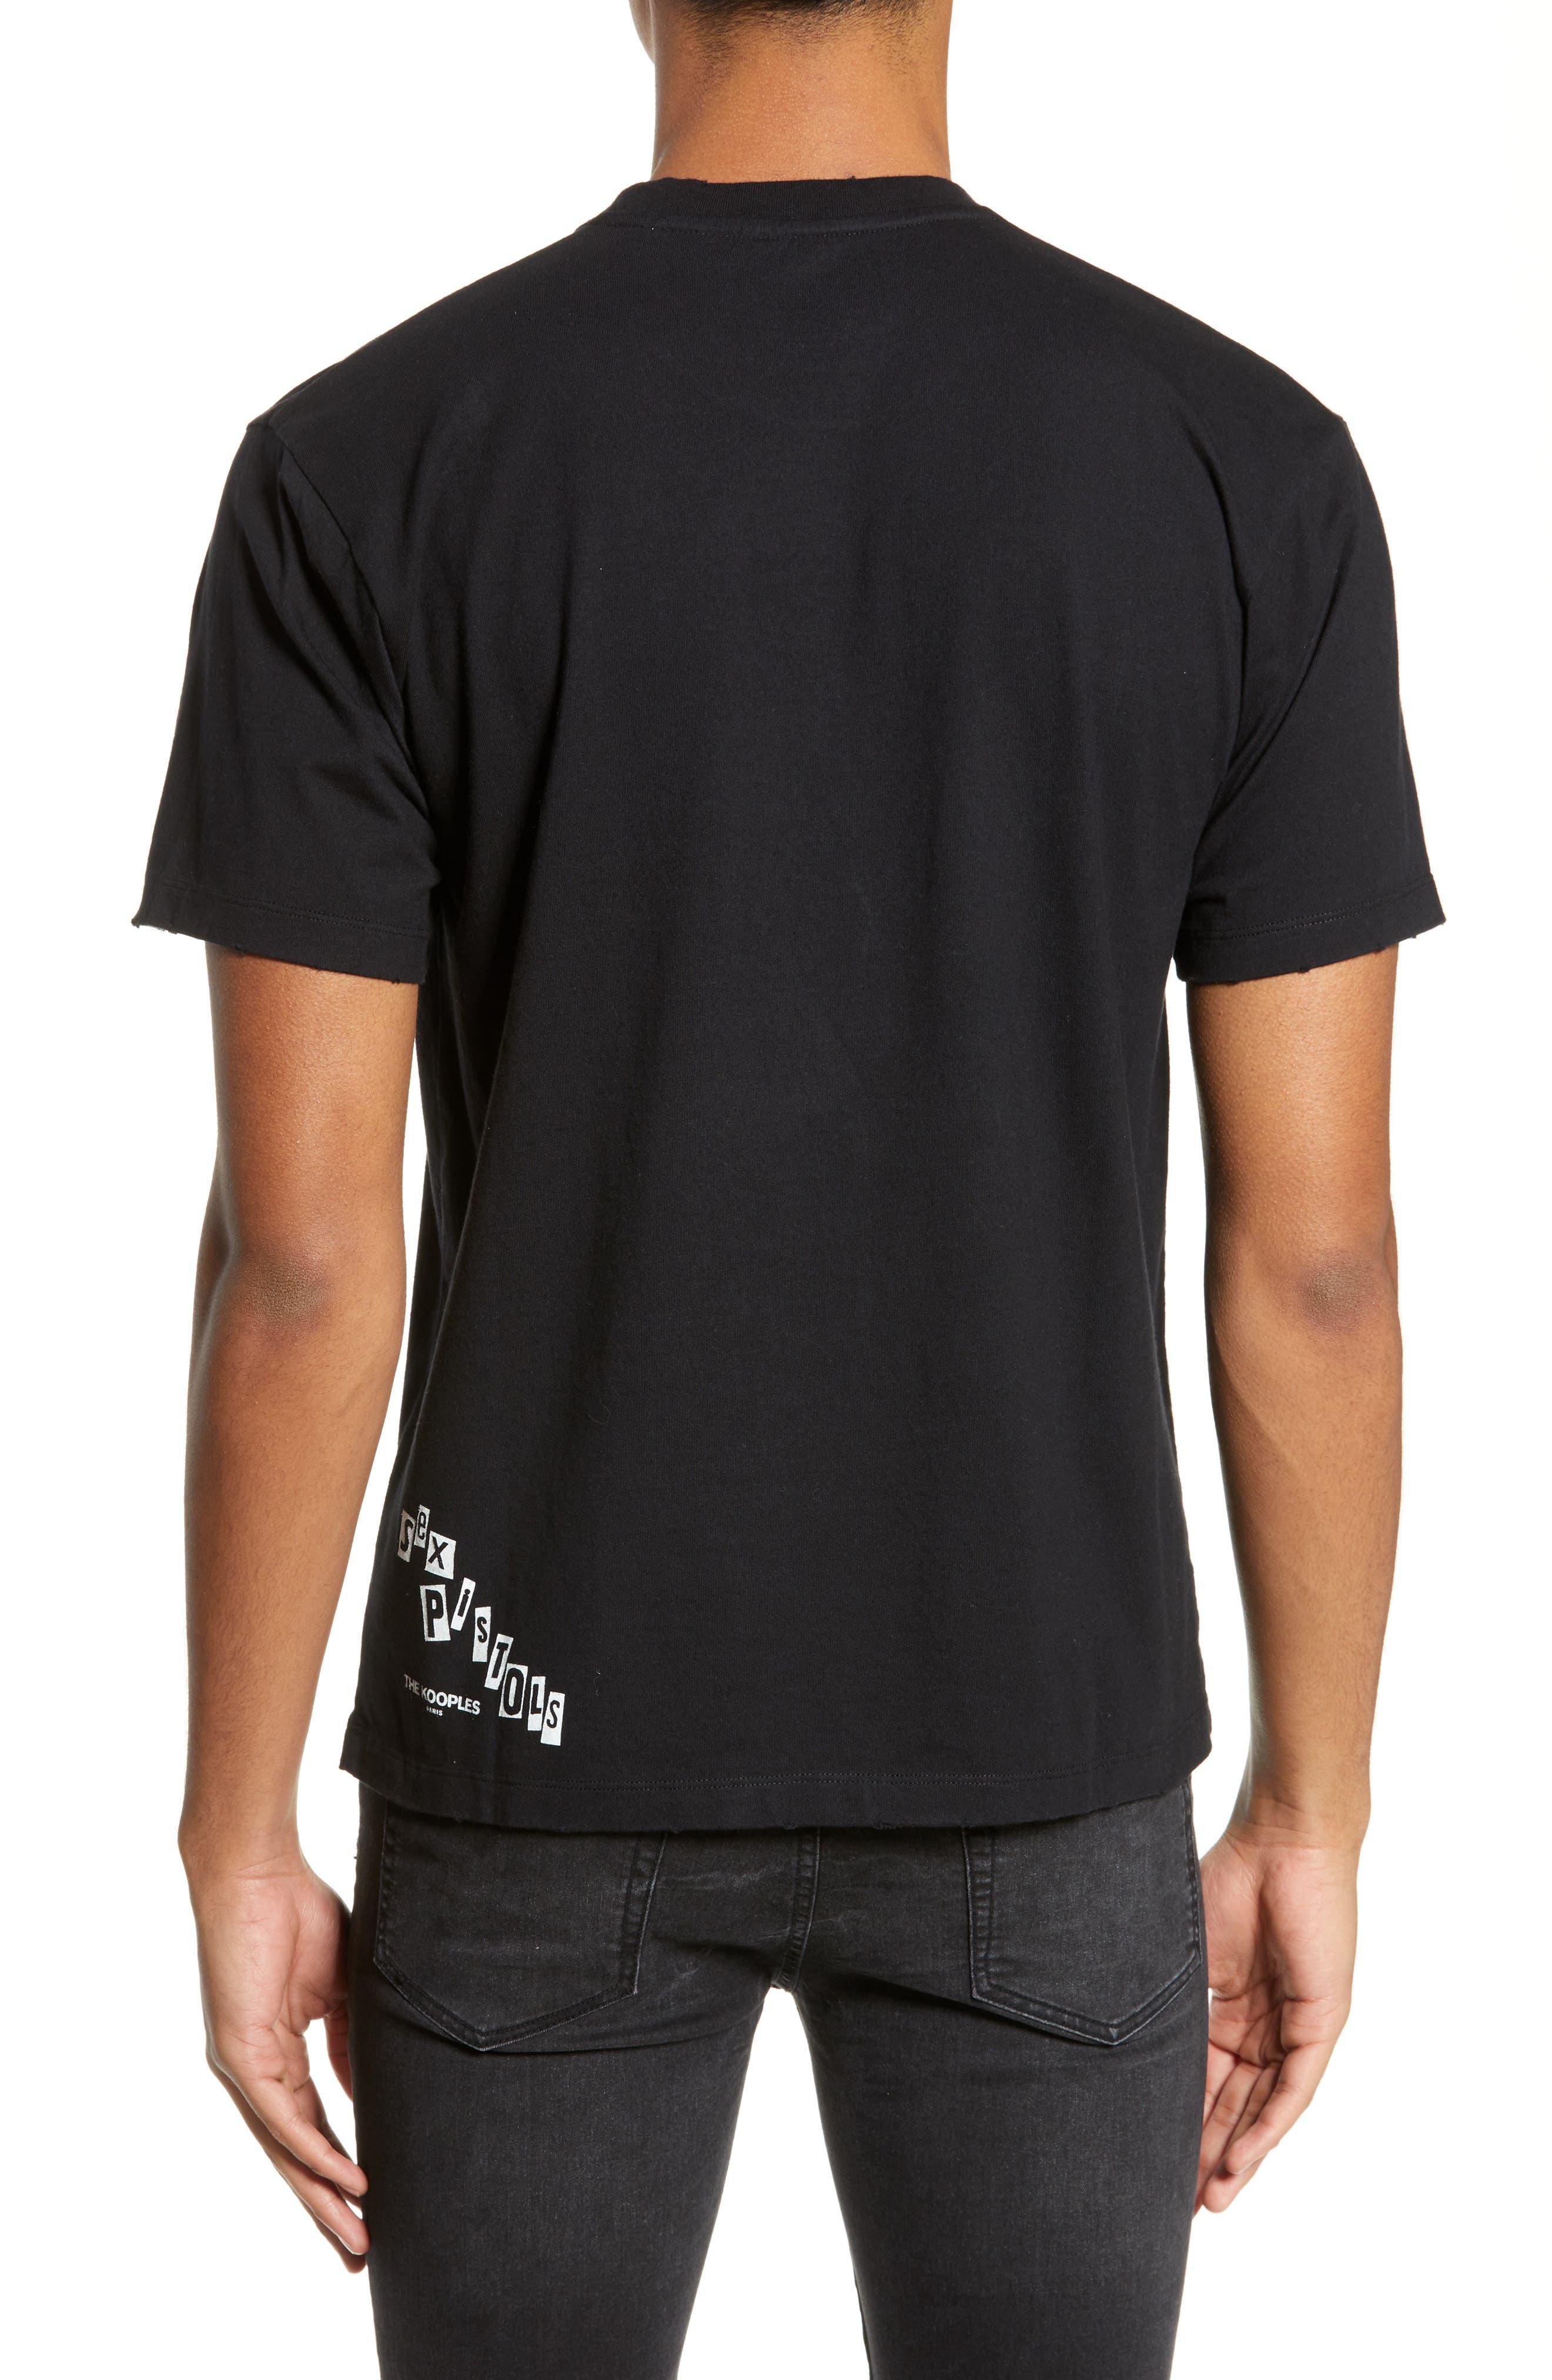 THE KOOPLES, Sex Pistols Graphic T-Shirt, Alternate thumbnail 2, color, 001